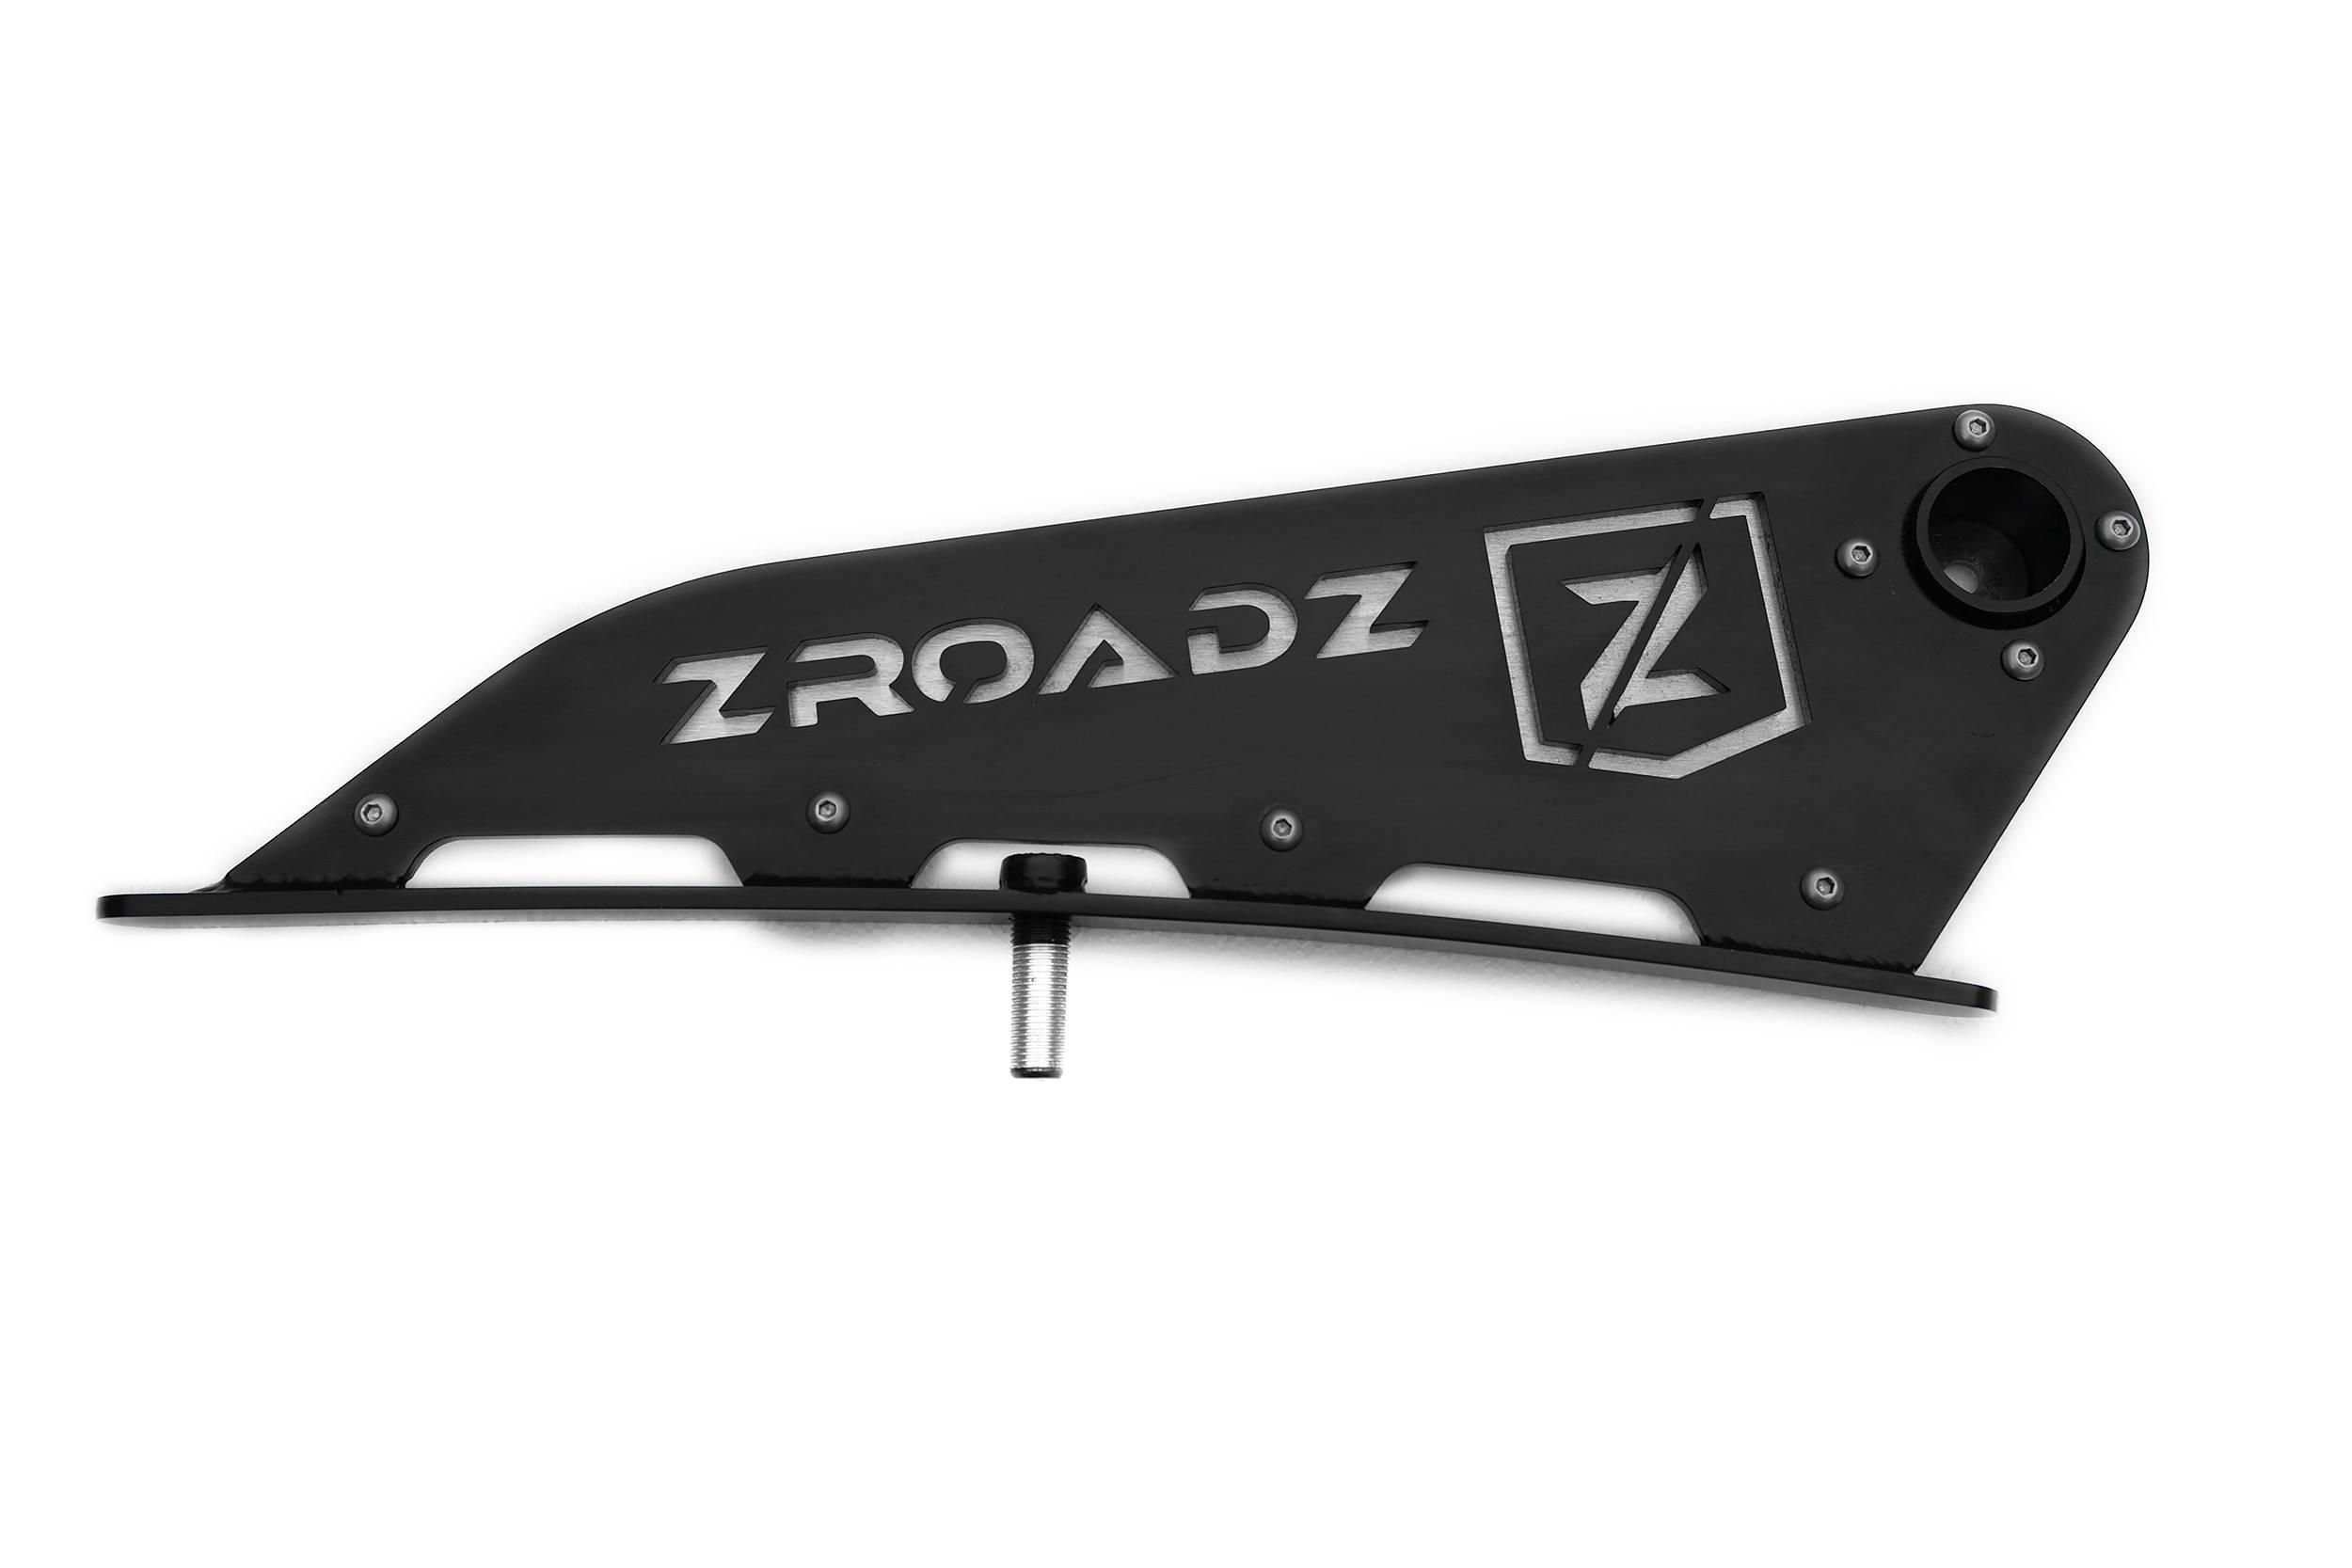 2007-2021 Toyota Tundra Front Roof LED Bracket to mount 50 Inch Straight LED Light Bar - PN #Z339141